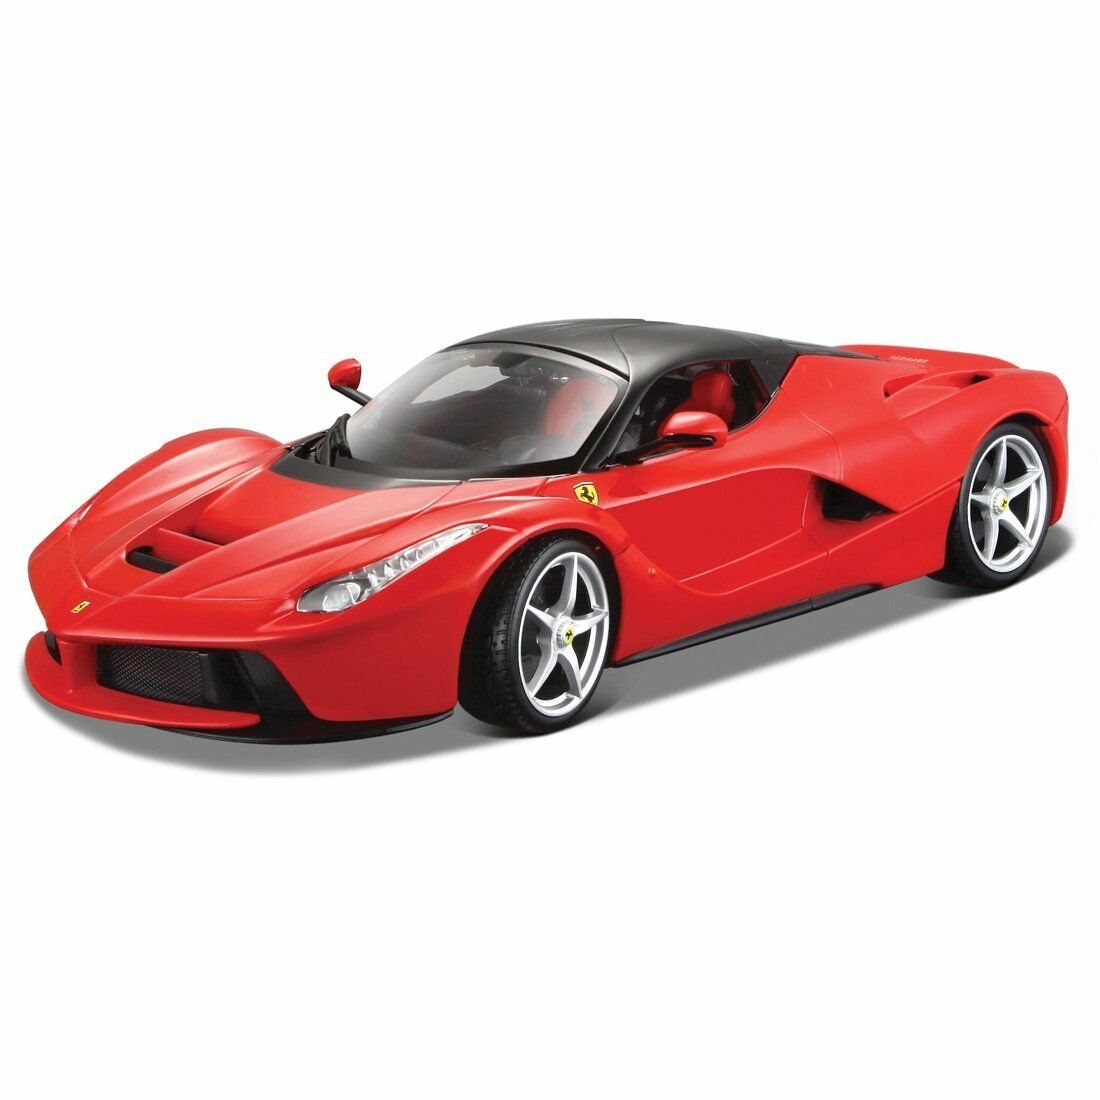 Bburago 1,18 ferrari laferrari ein diecast modell rcing auto fahrzeug - spielzeug new in box